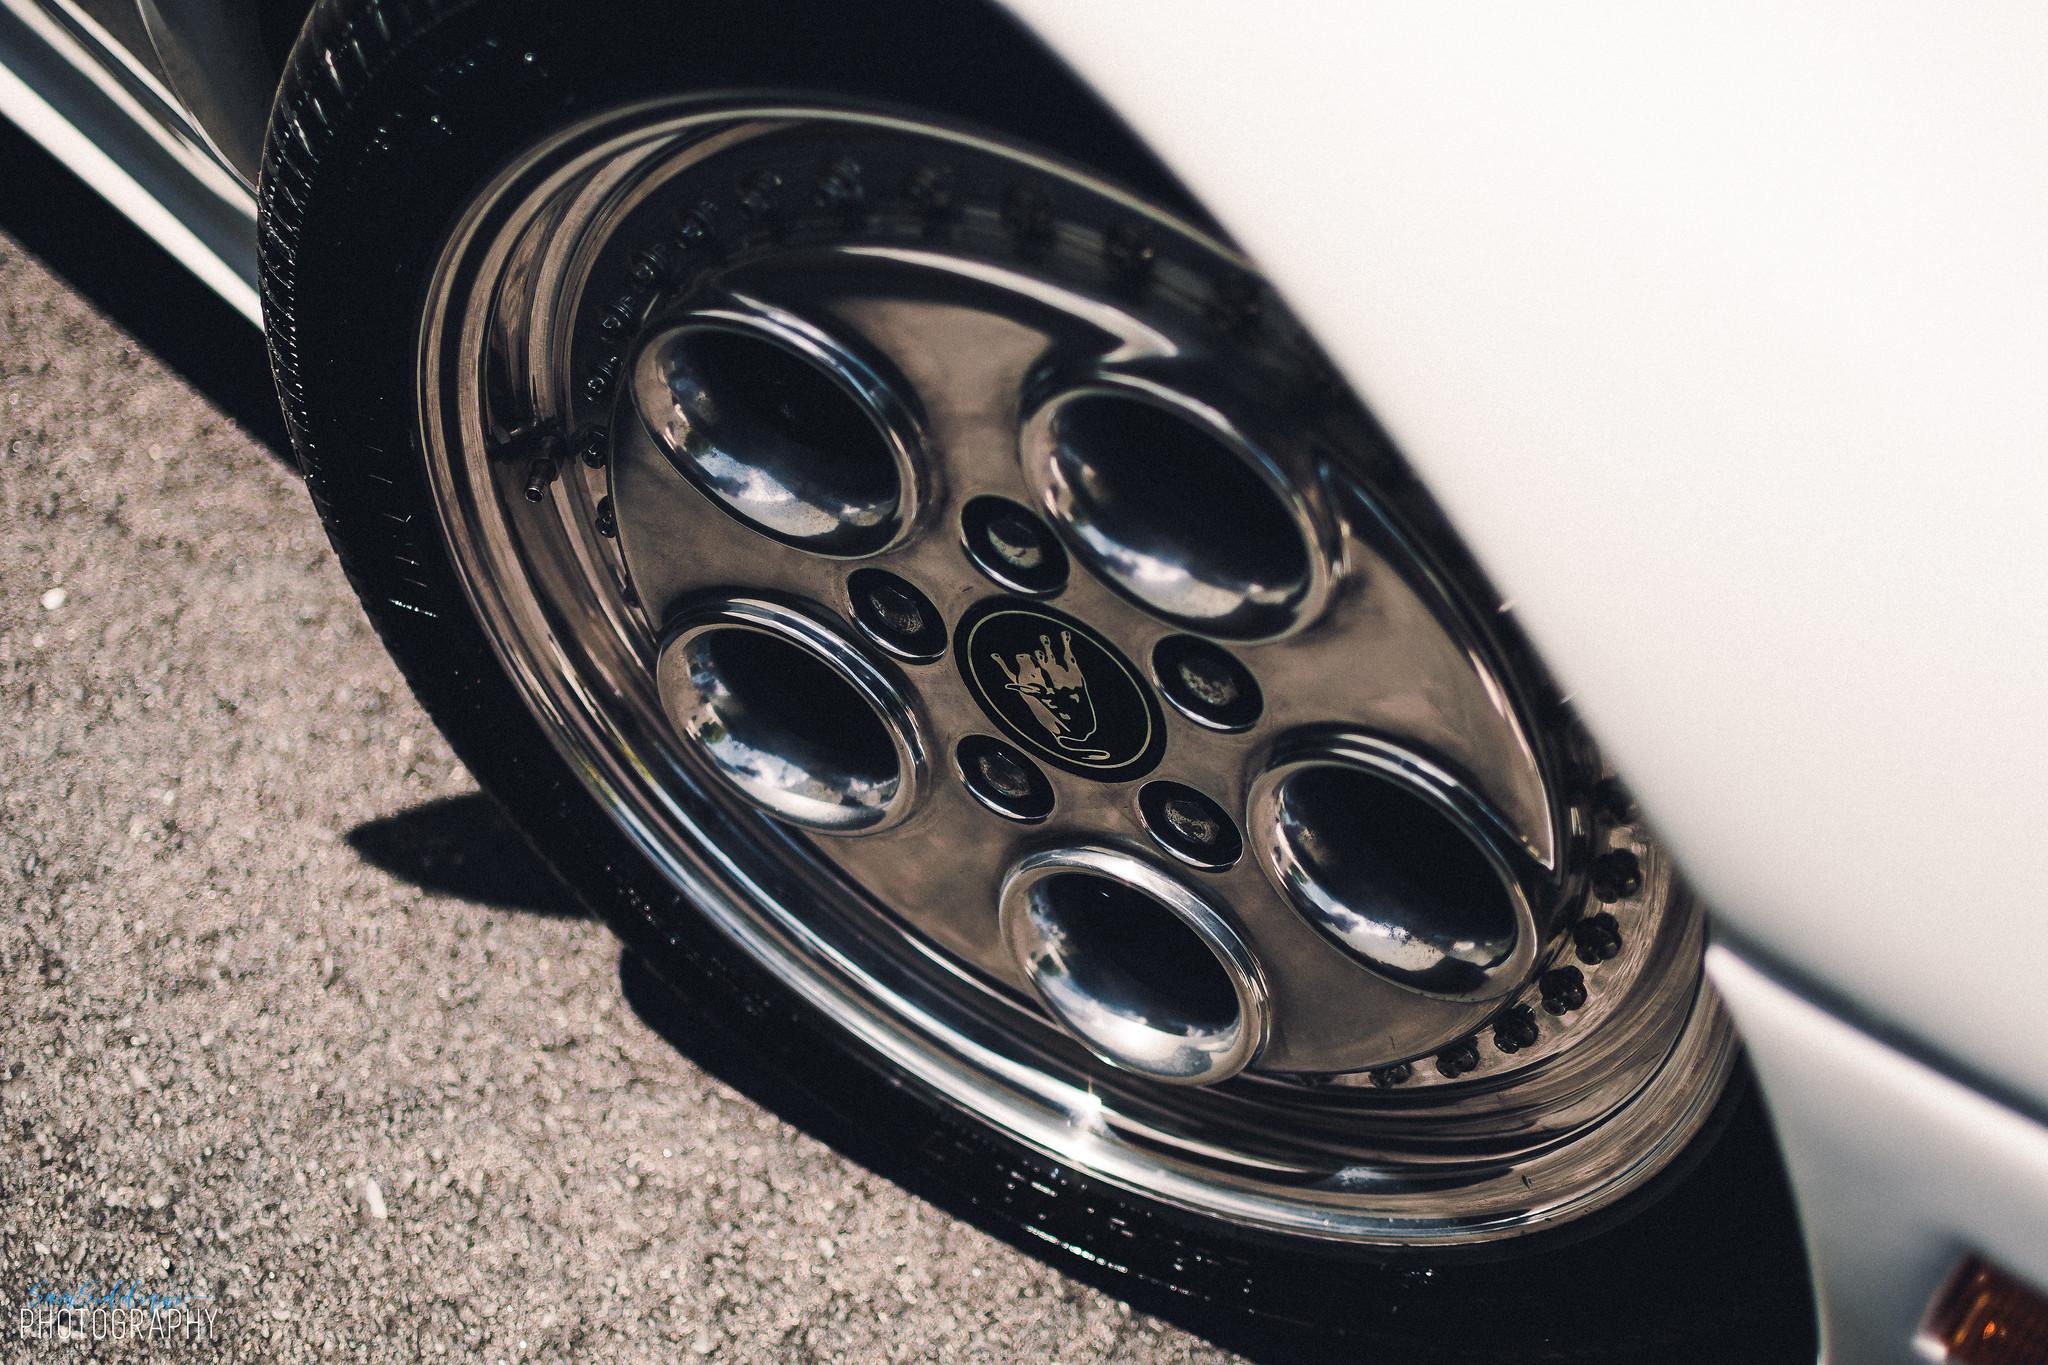 1991 White Lamborghini Diablo Wheel